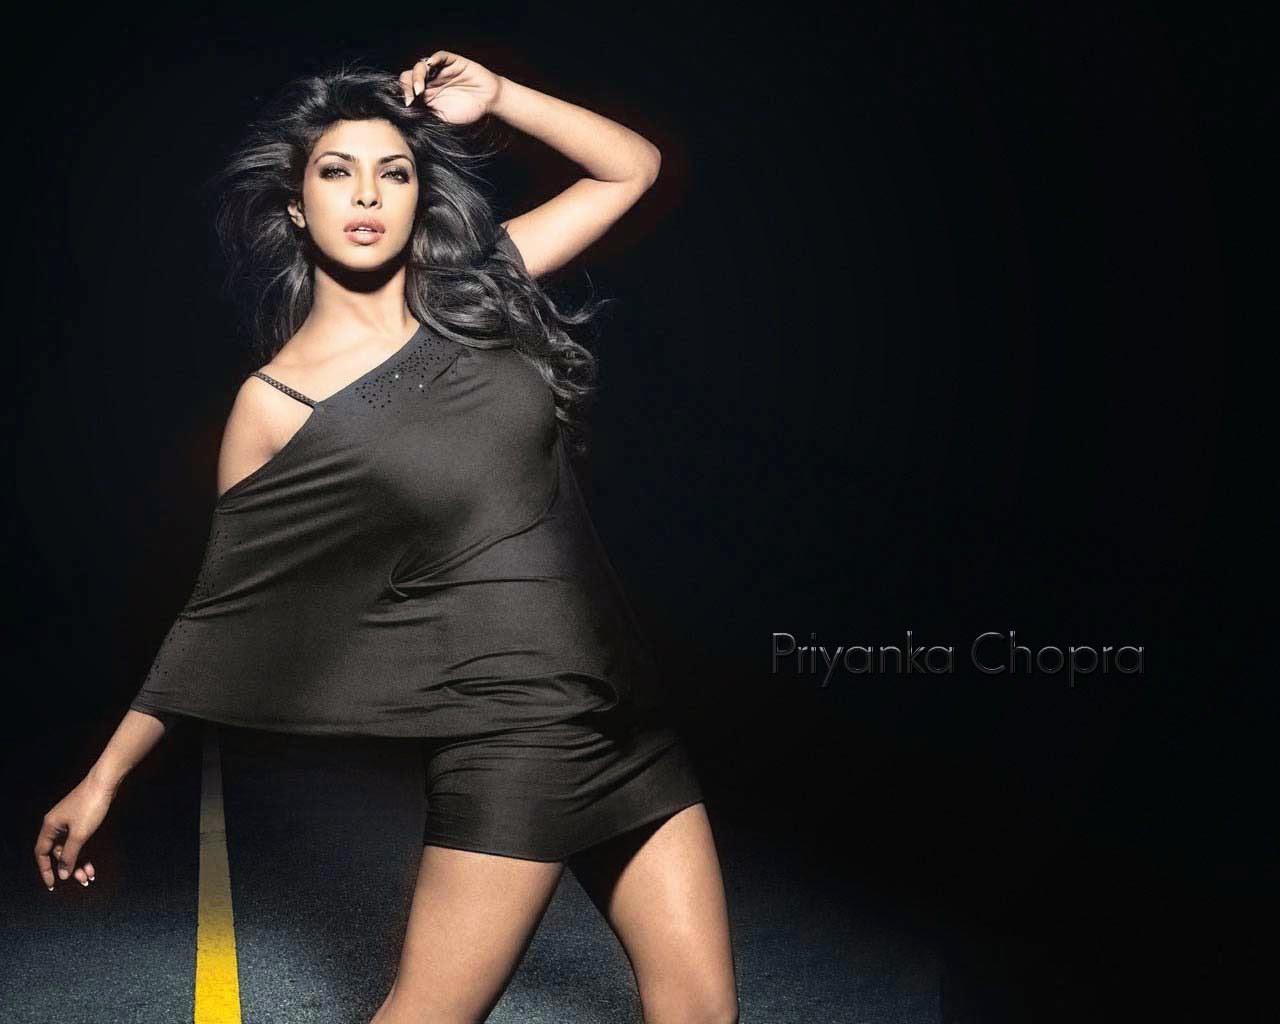 Priyanka Chopra | Hot HD Wallpapers 2014-2015